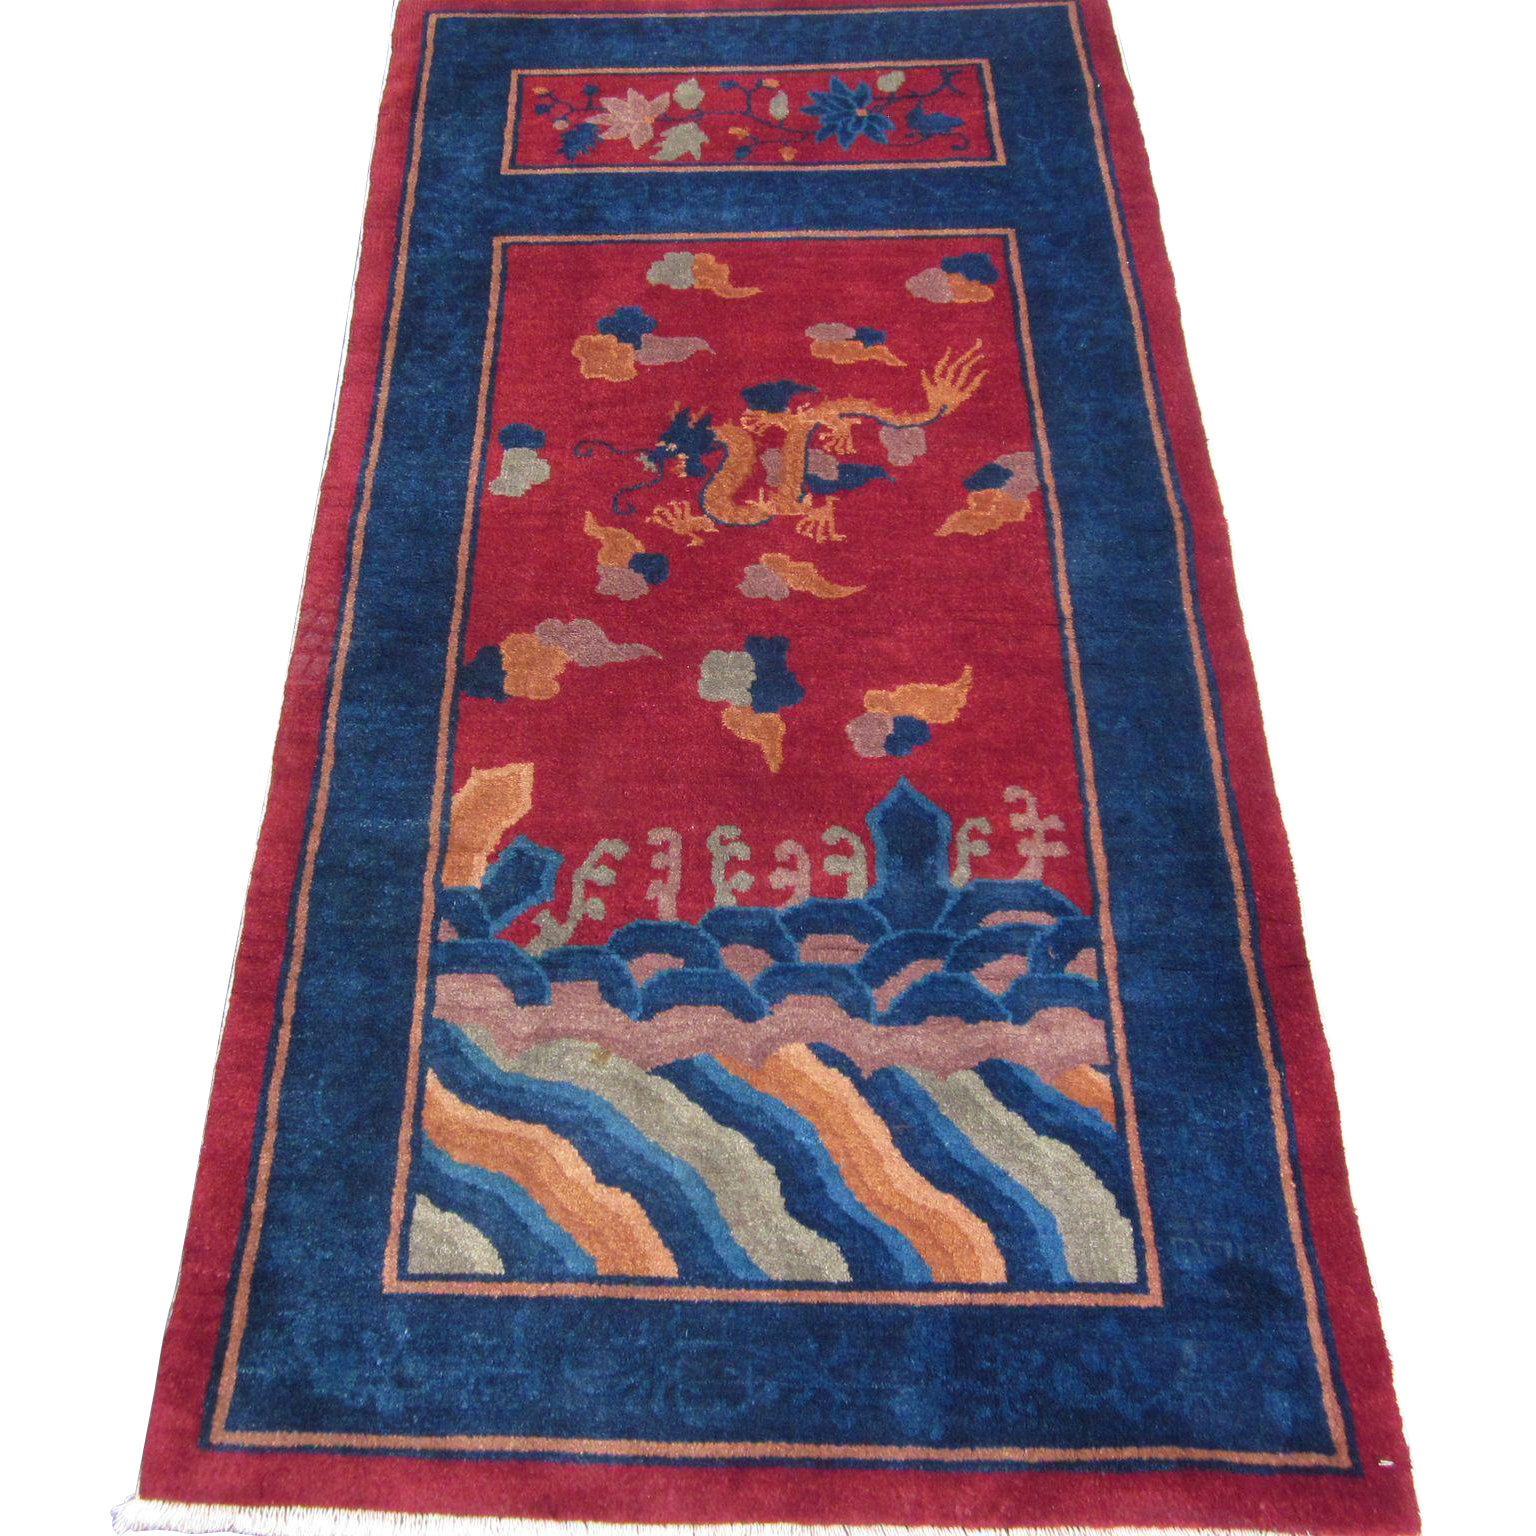 Chinese Art Deco Oriental Rug Northeast China 1920 S 5